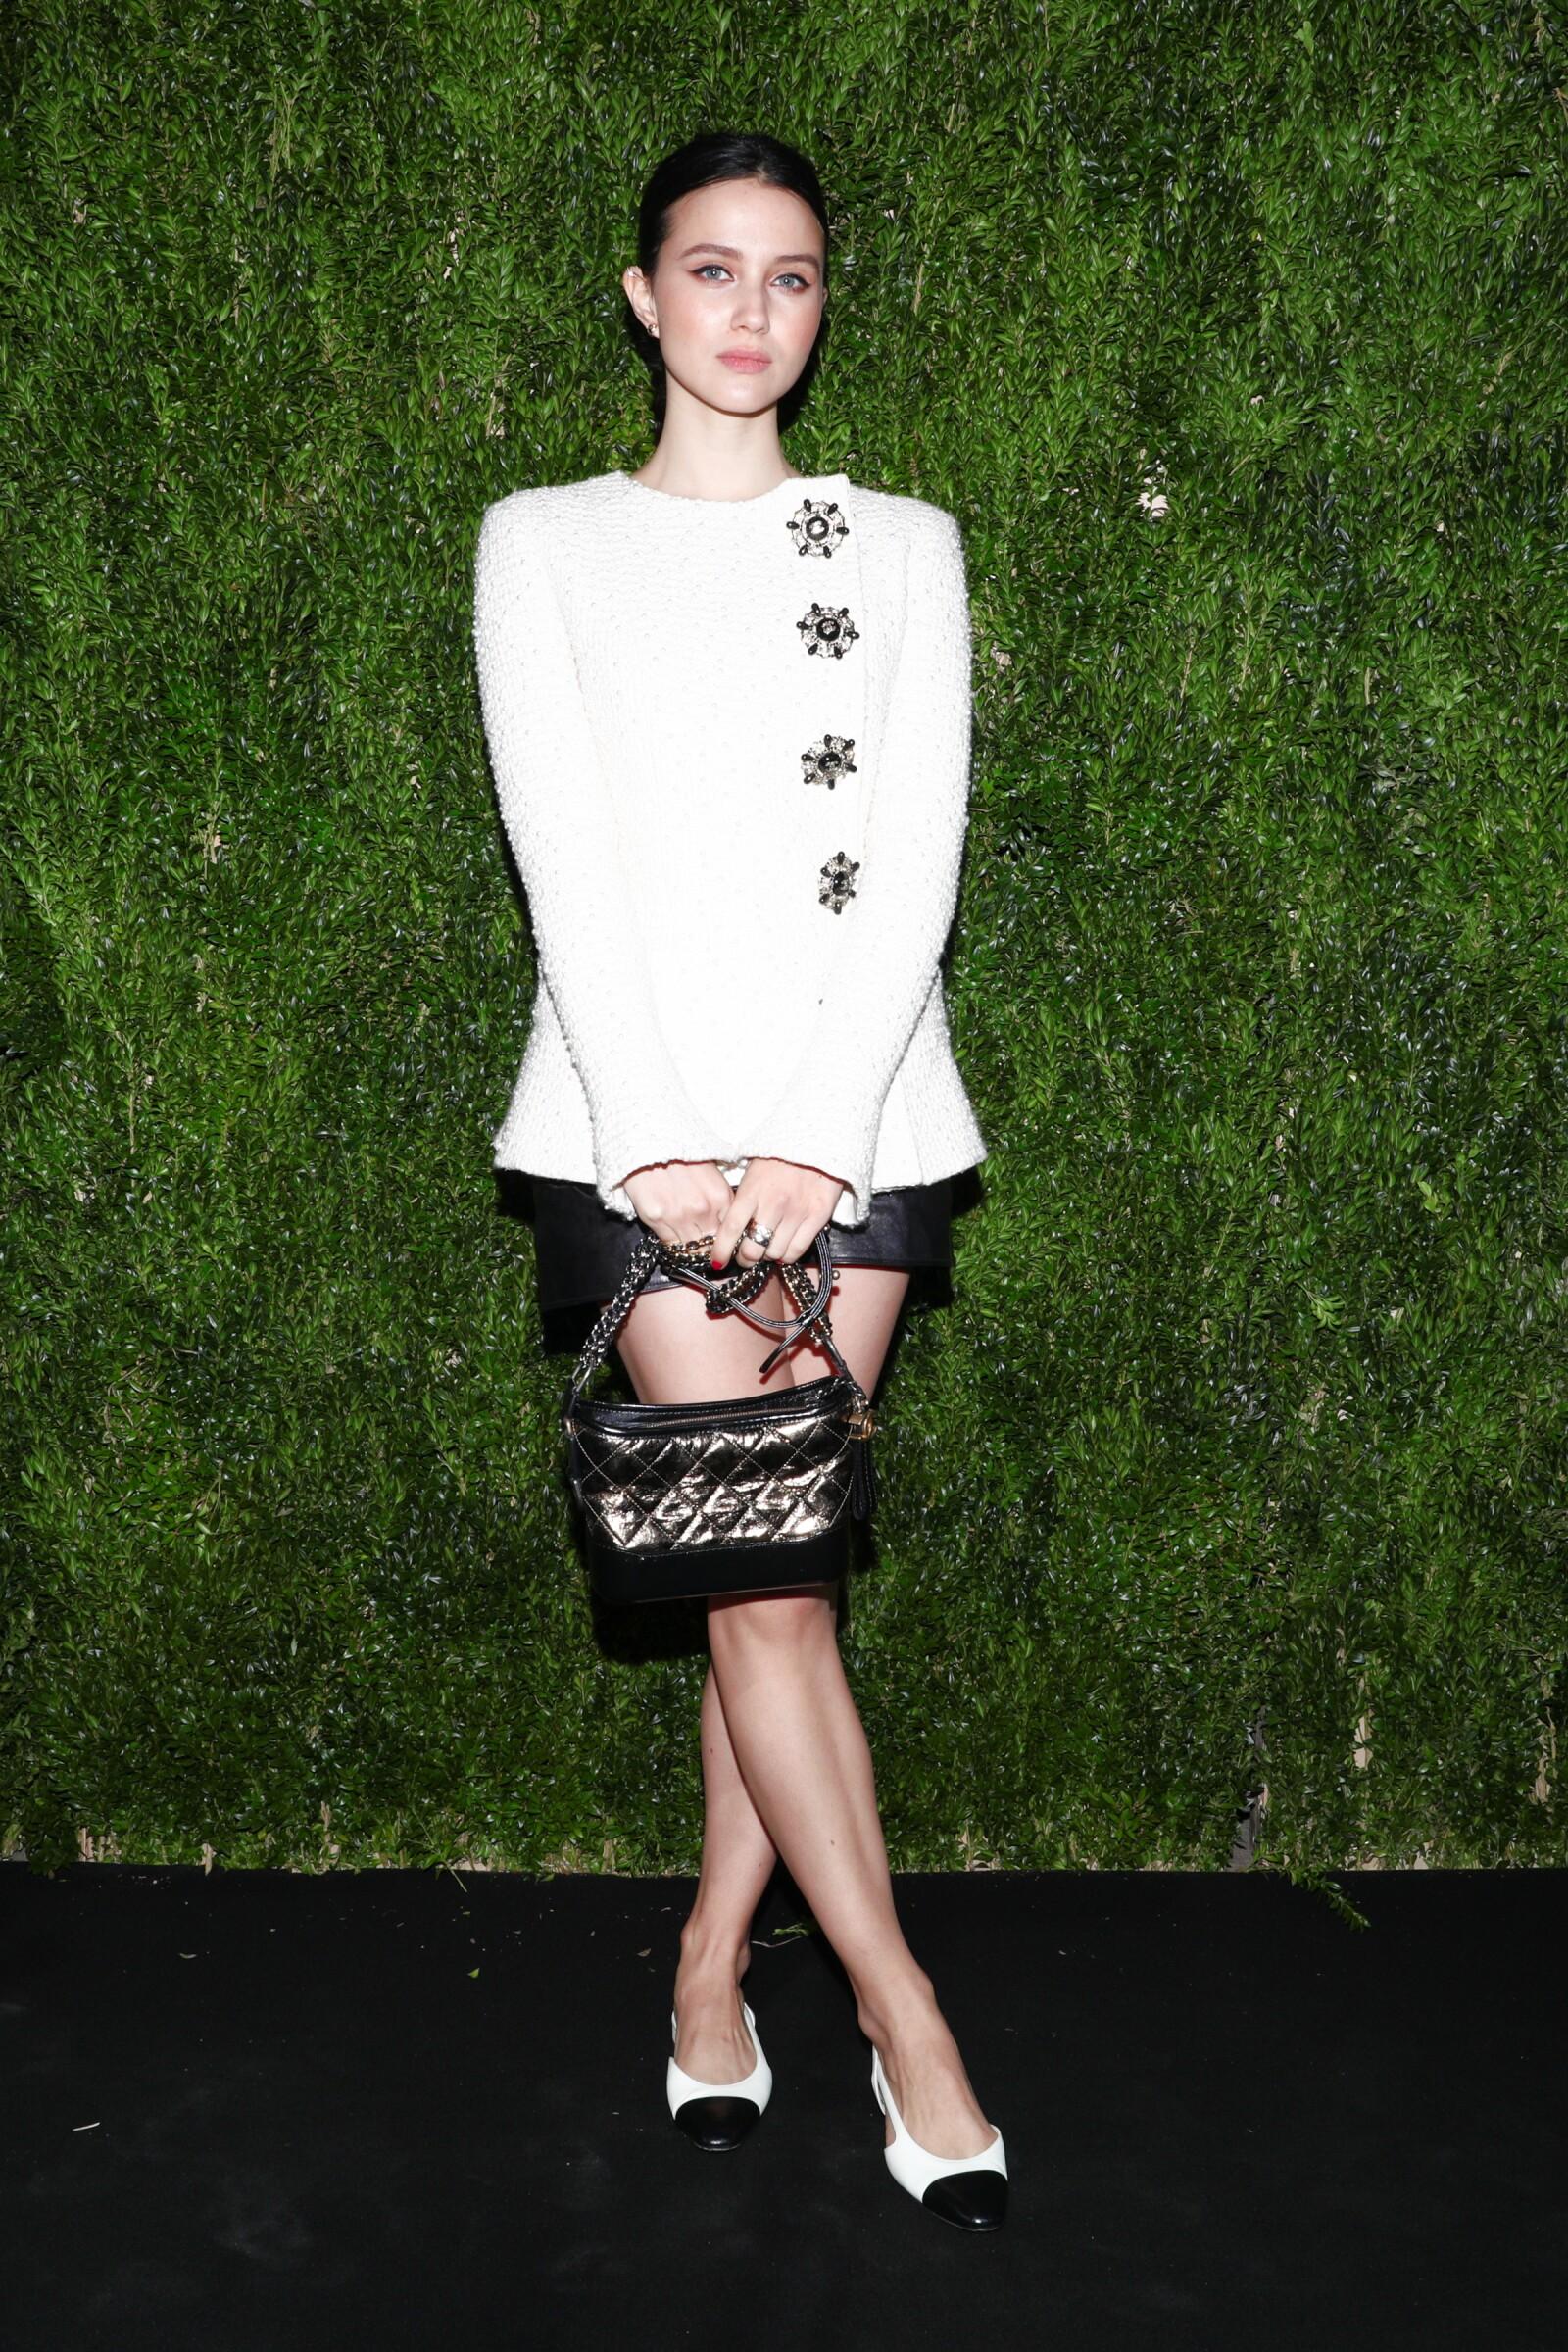 En el luncheon de Chanel, Julia Goldani Telles, trae un look on point de mademoiselle Coco